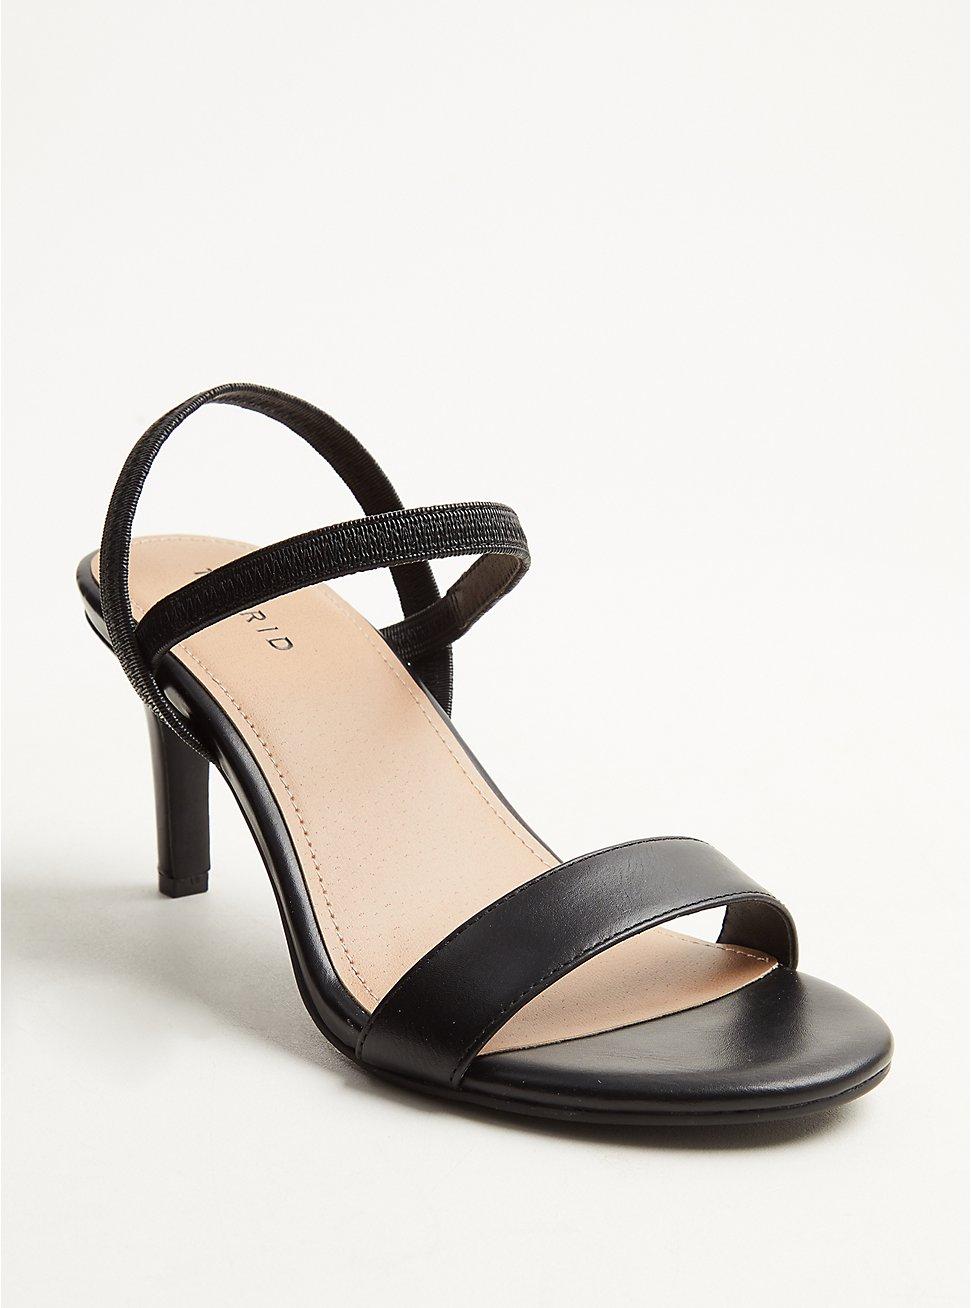 Black Faux Leather Slingback Heel (WW), , hi-res